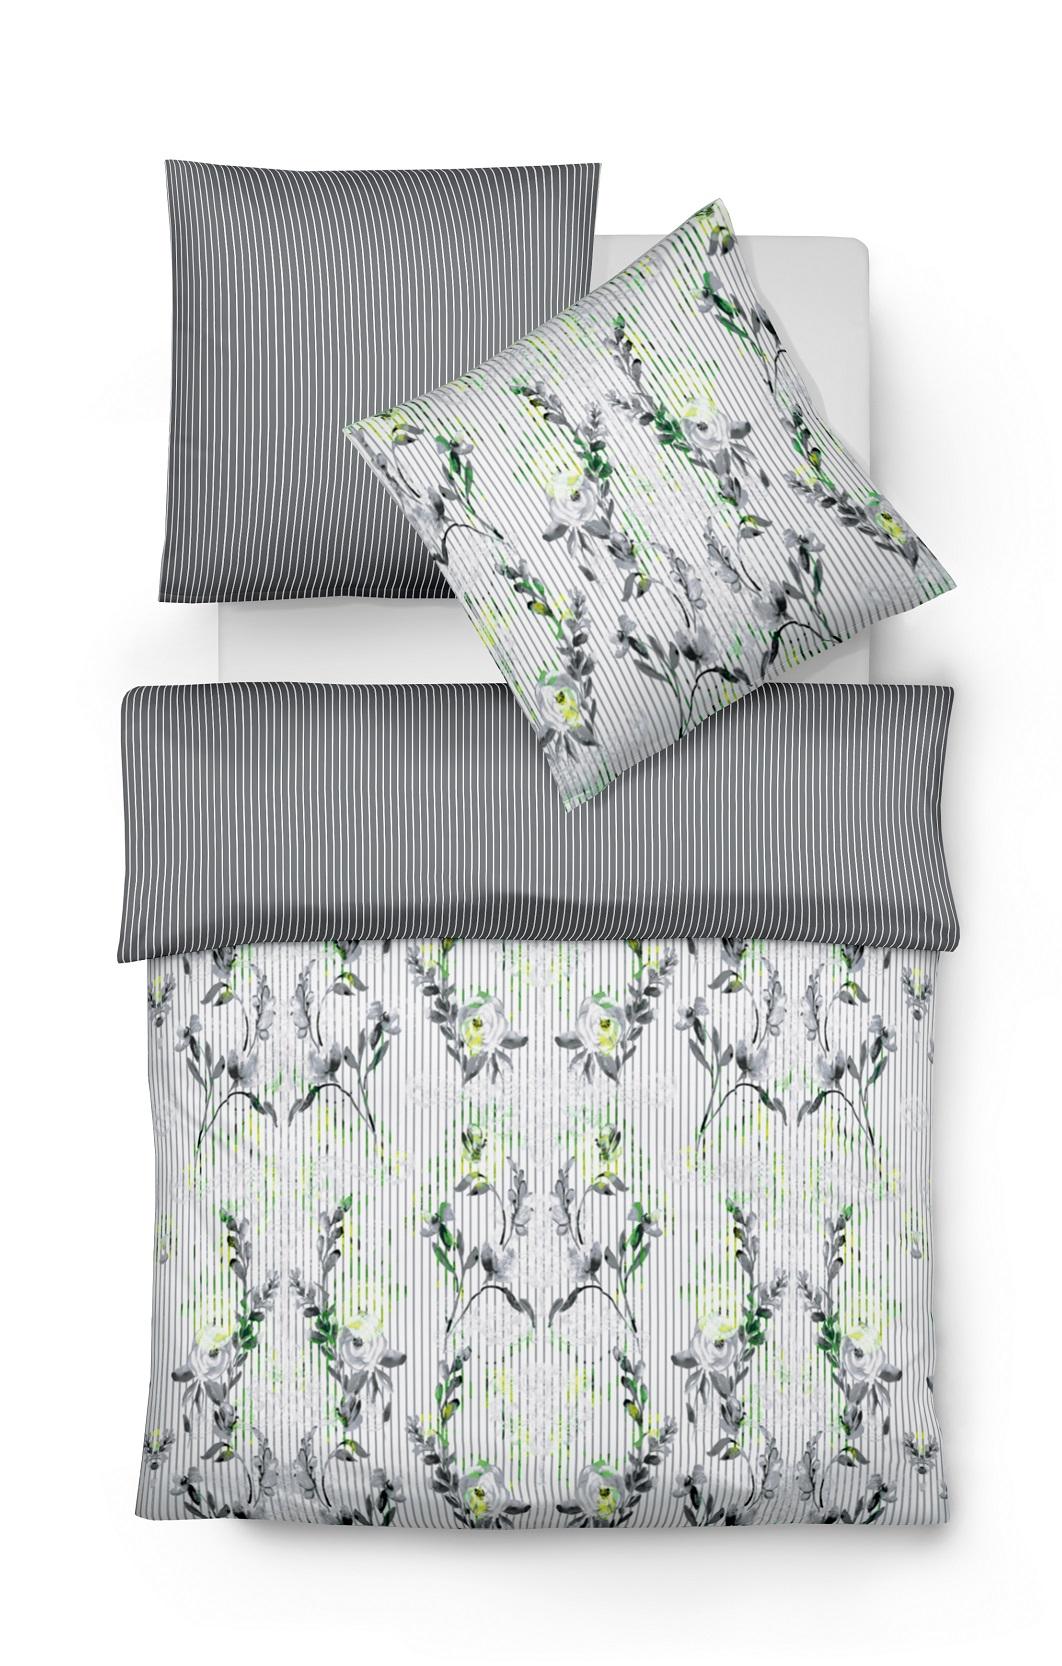 Fleuresse Mako Satin Digitaldruck Bettwäsche Hamptons Bed Art S Größe 155x22080x80 Cm Farbe Limette